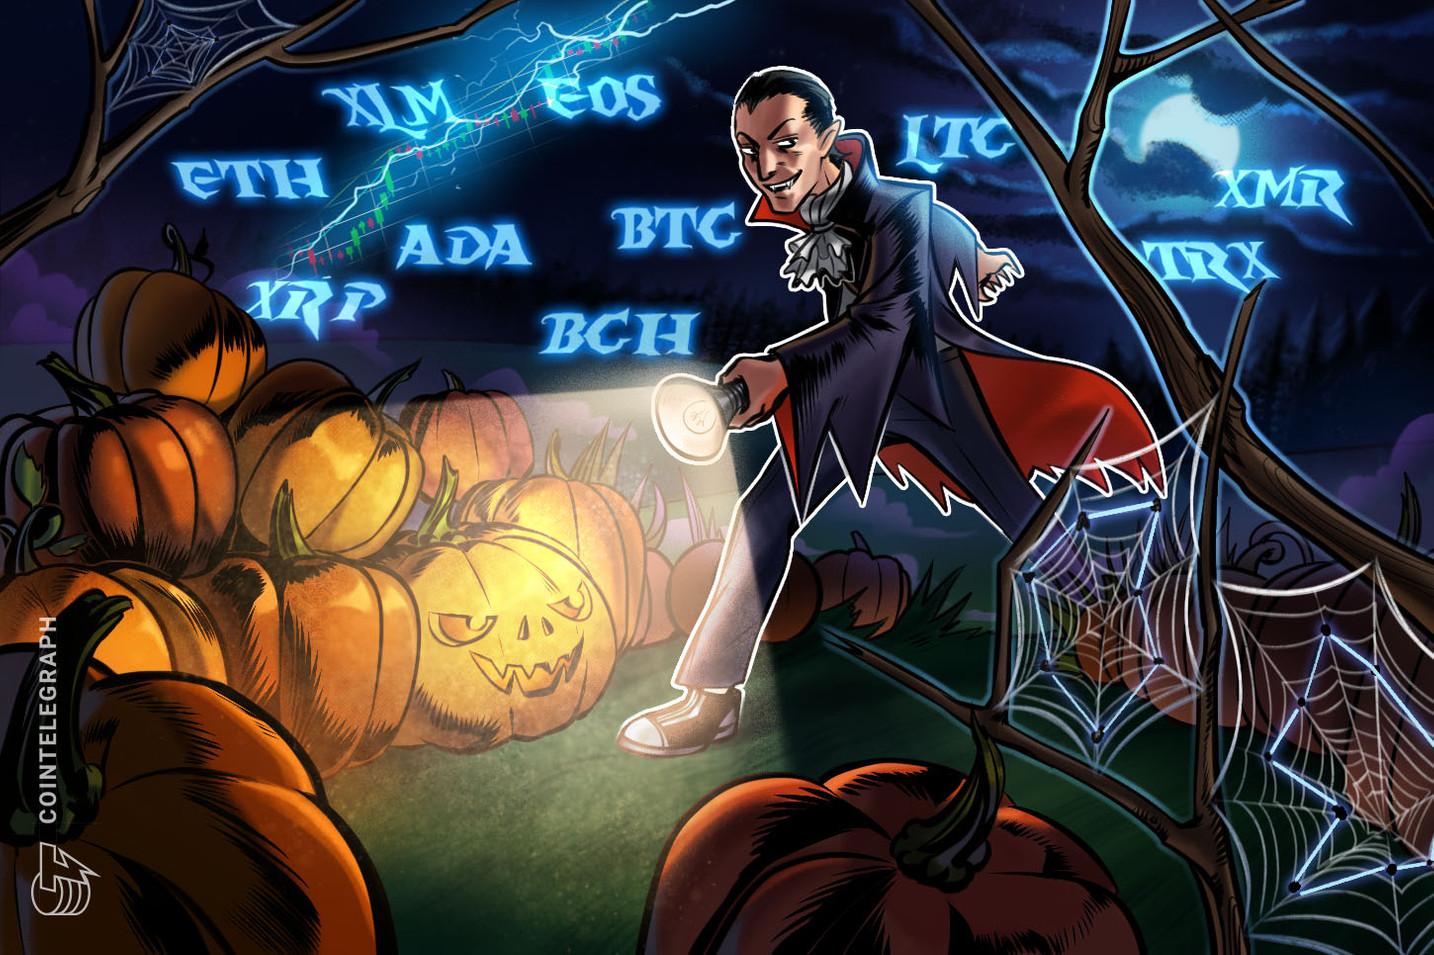 Kursanalyse, 31. Oktober: Bitcoin, Ethereum, Ripple, Bitcoin Cash, EOS, Stellar, Litecoin, Cardano, Monero, TRON